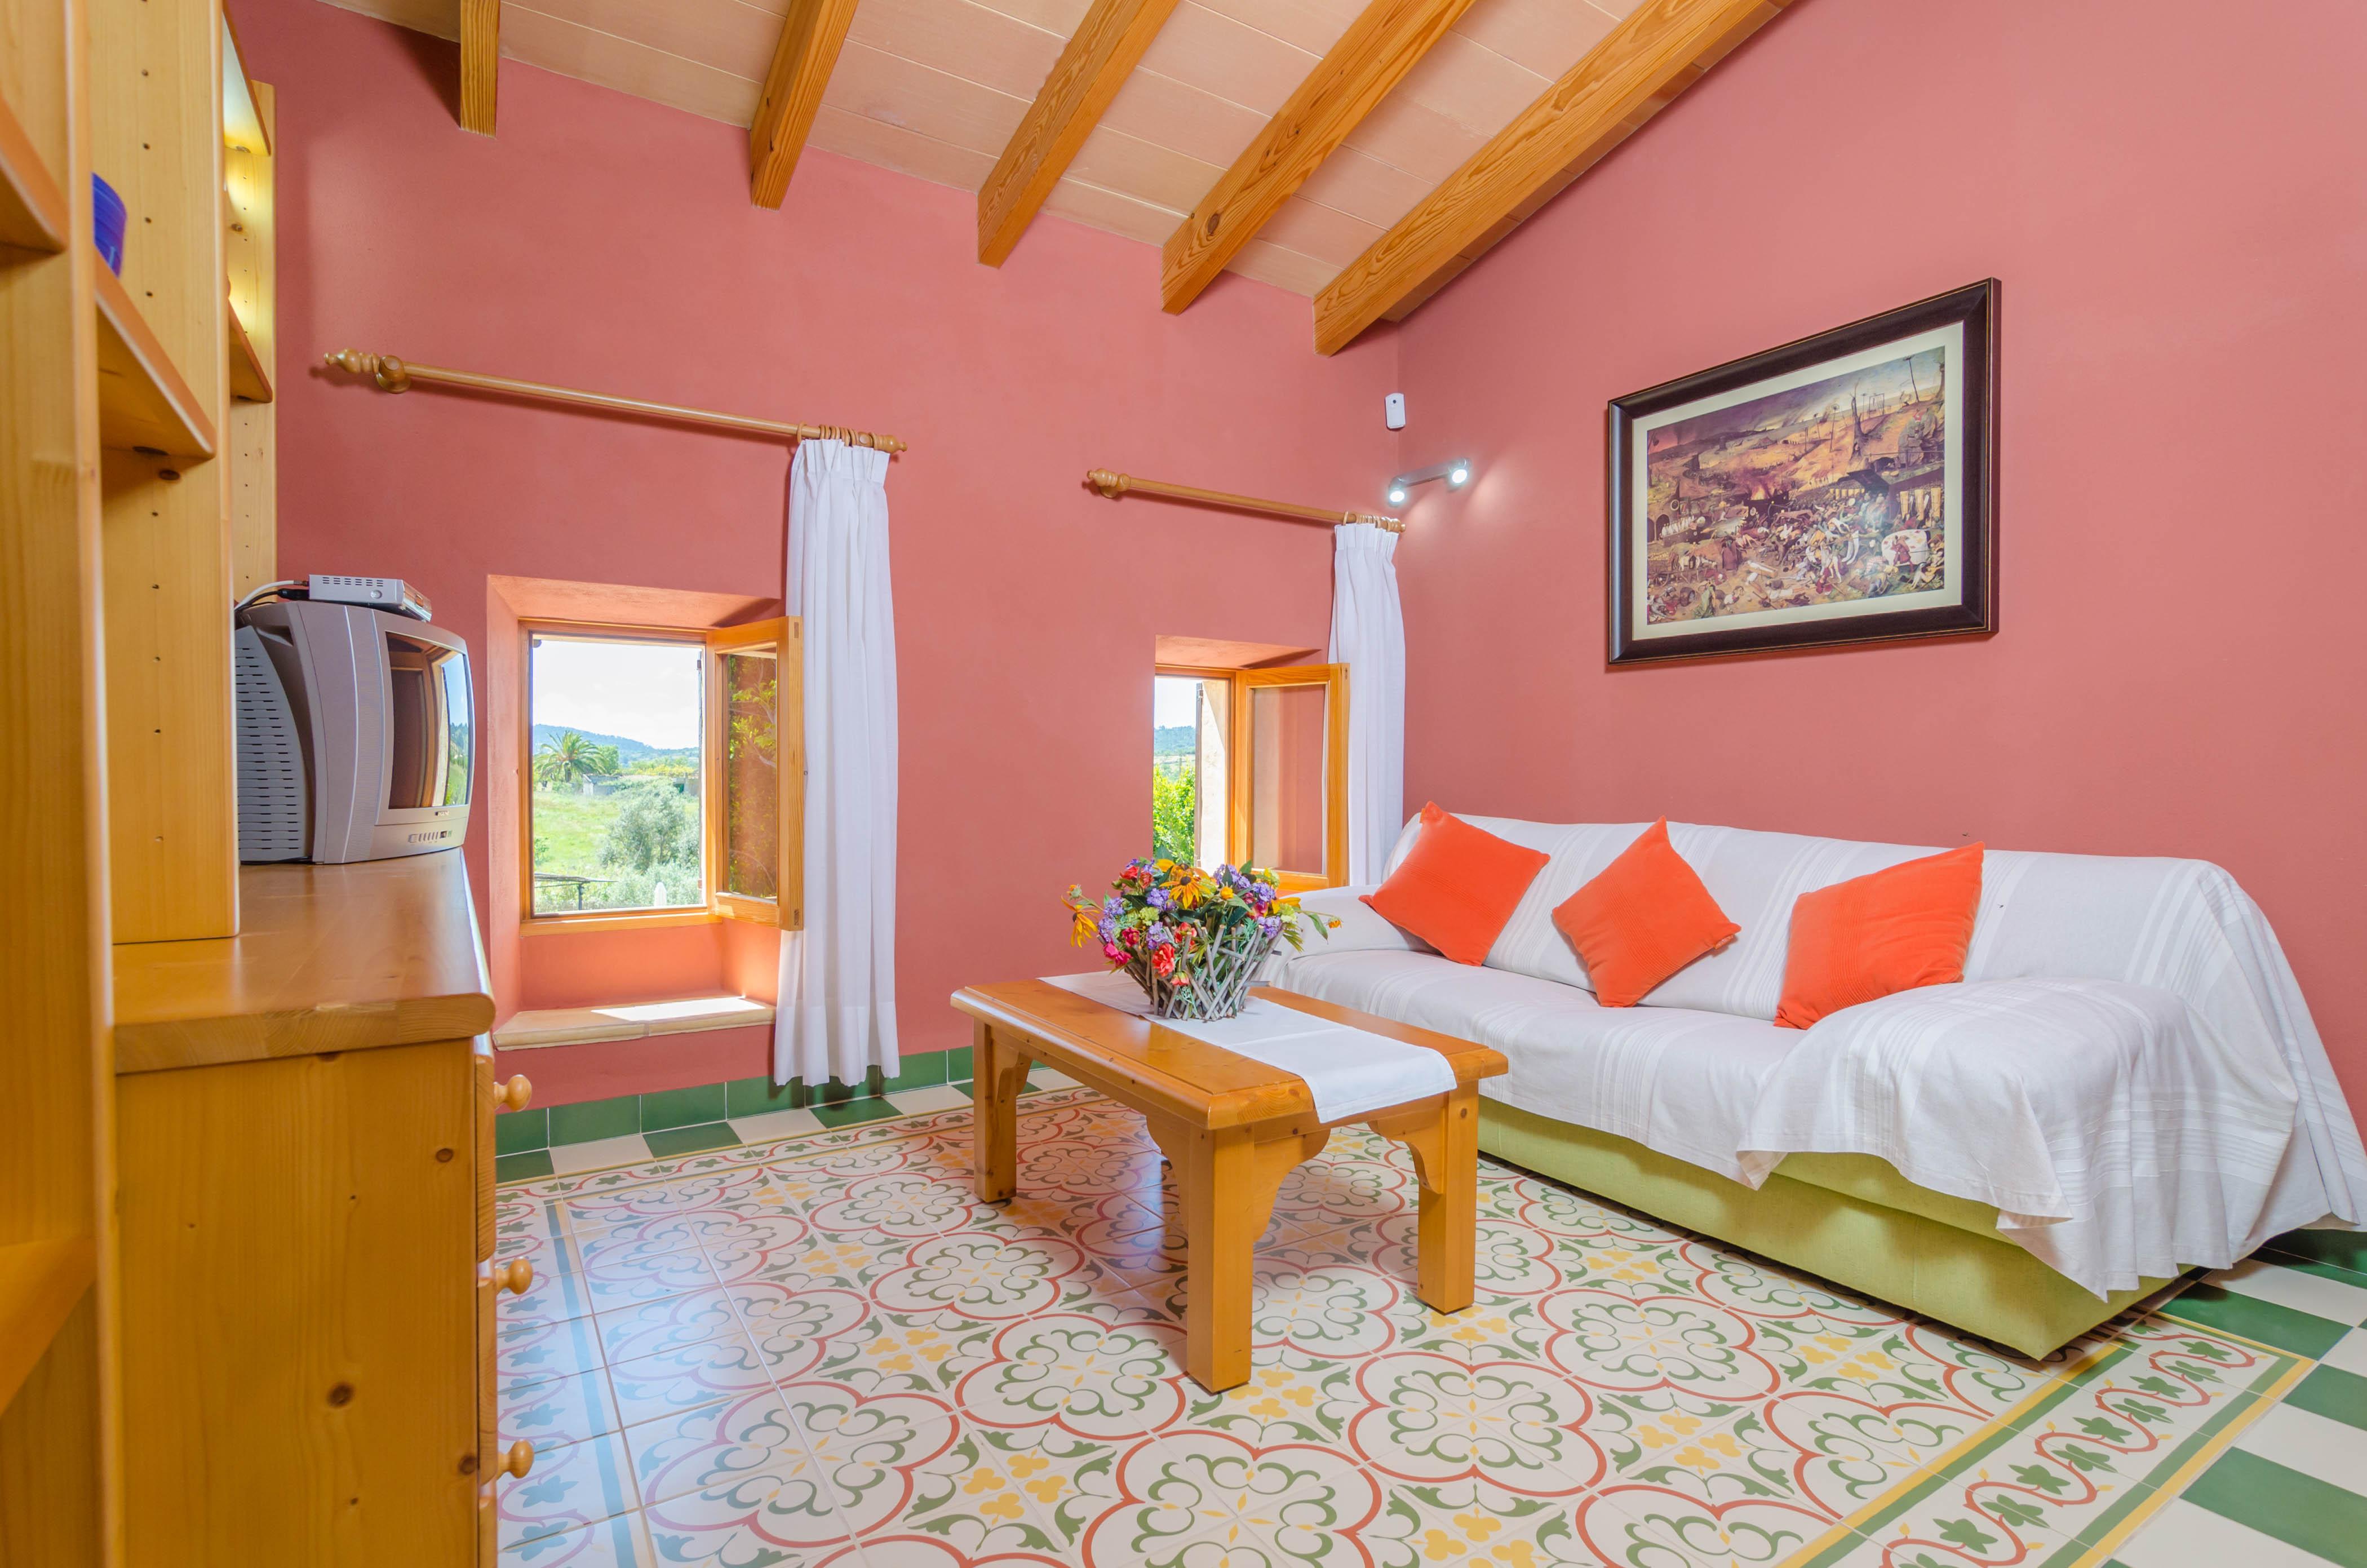 Ferienhaus SON MACIA (2186582), Son Macià, Mallorca, Balearische Inseln, Spanien, Bild 32